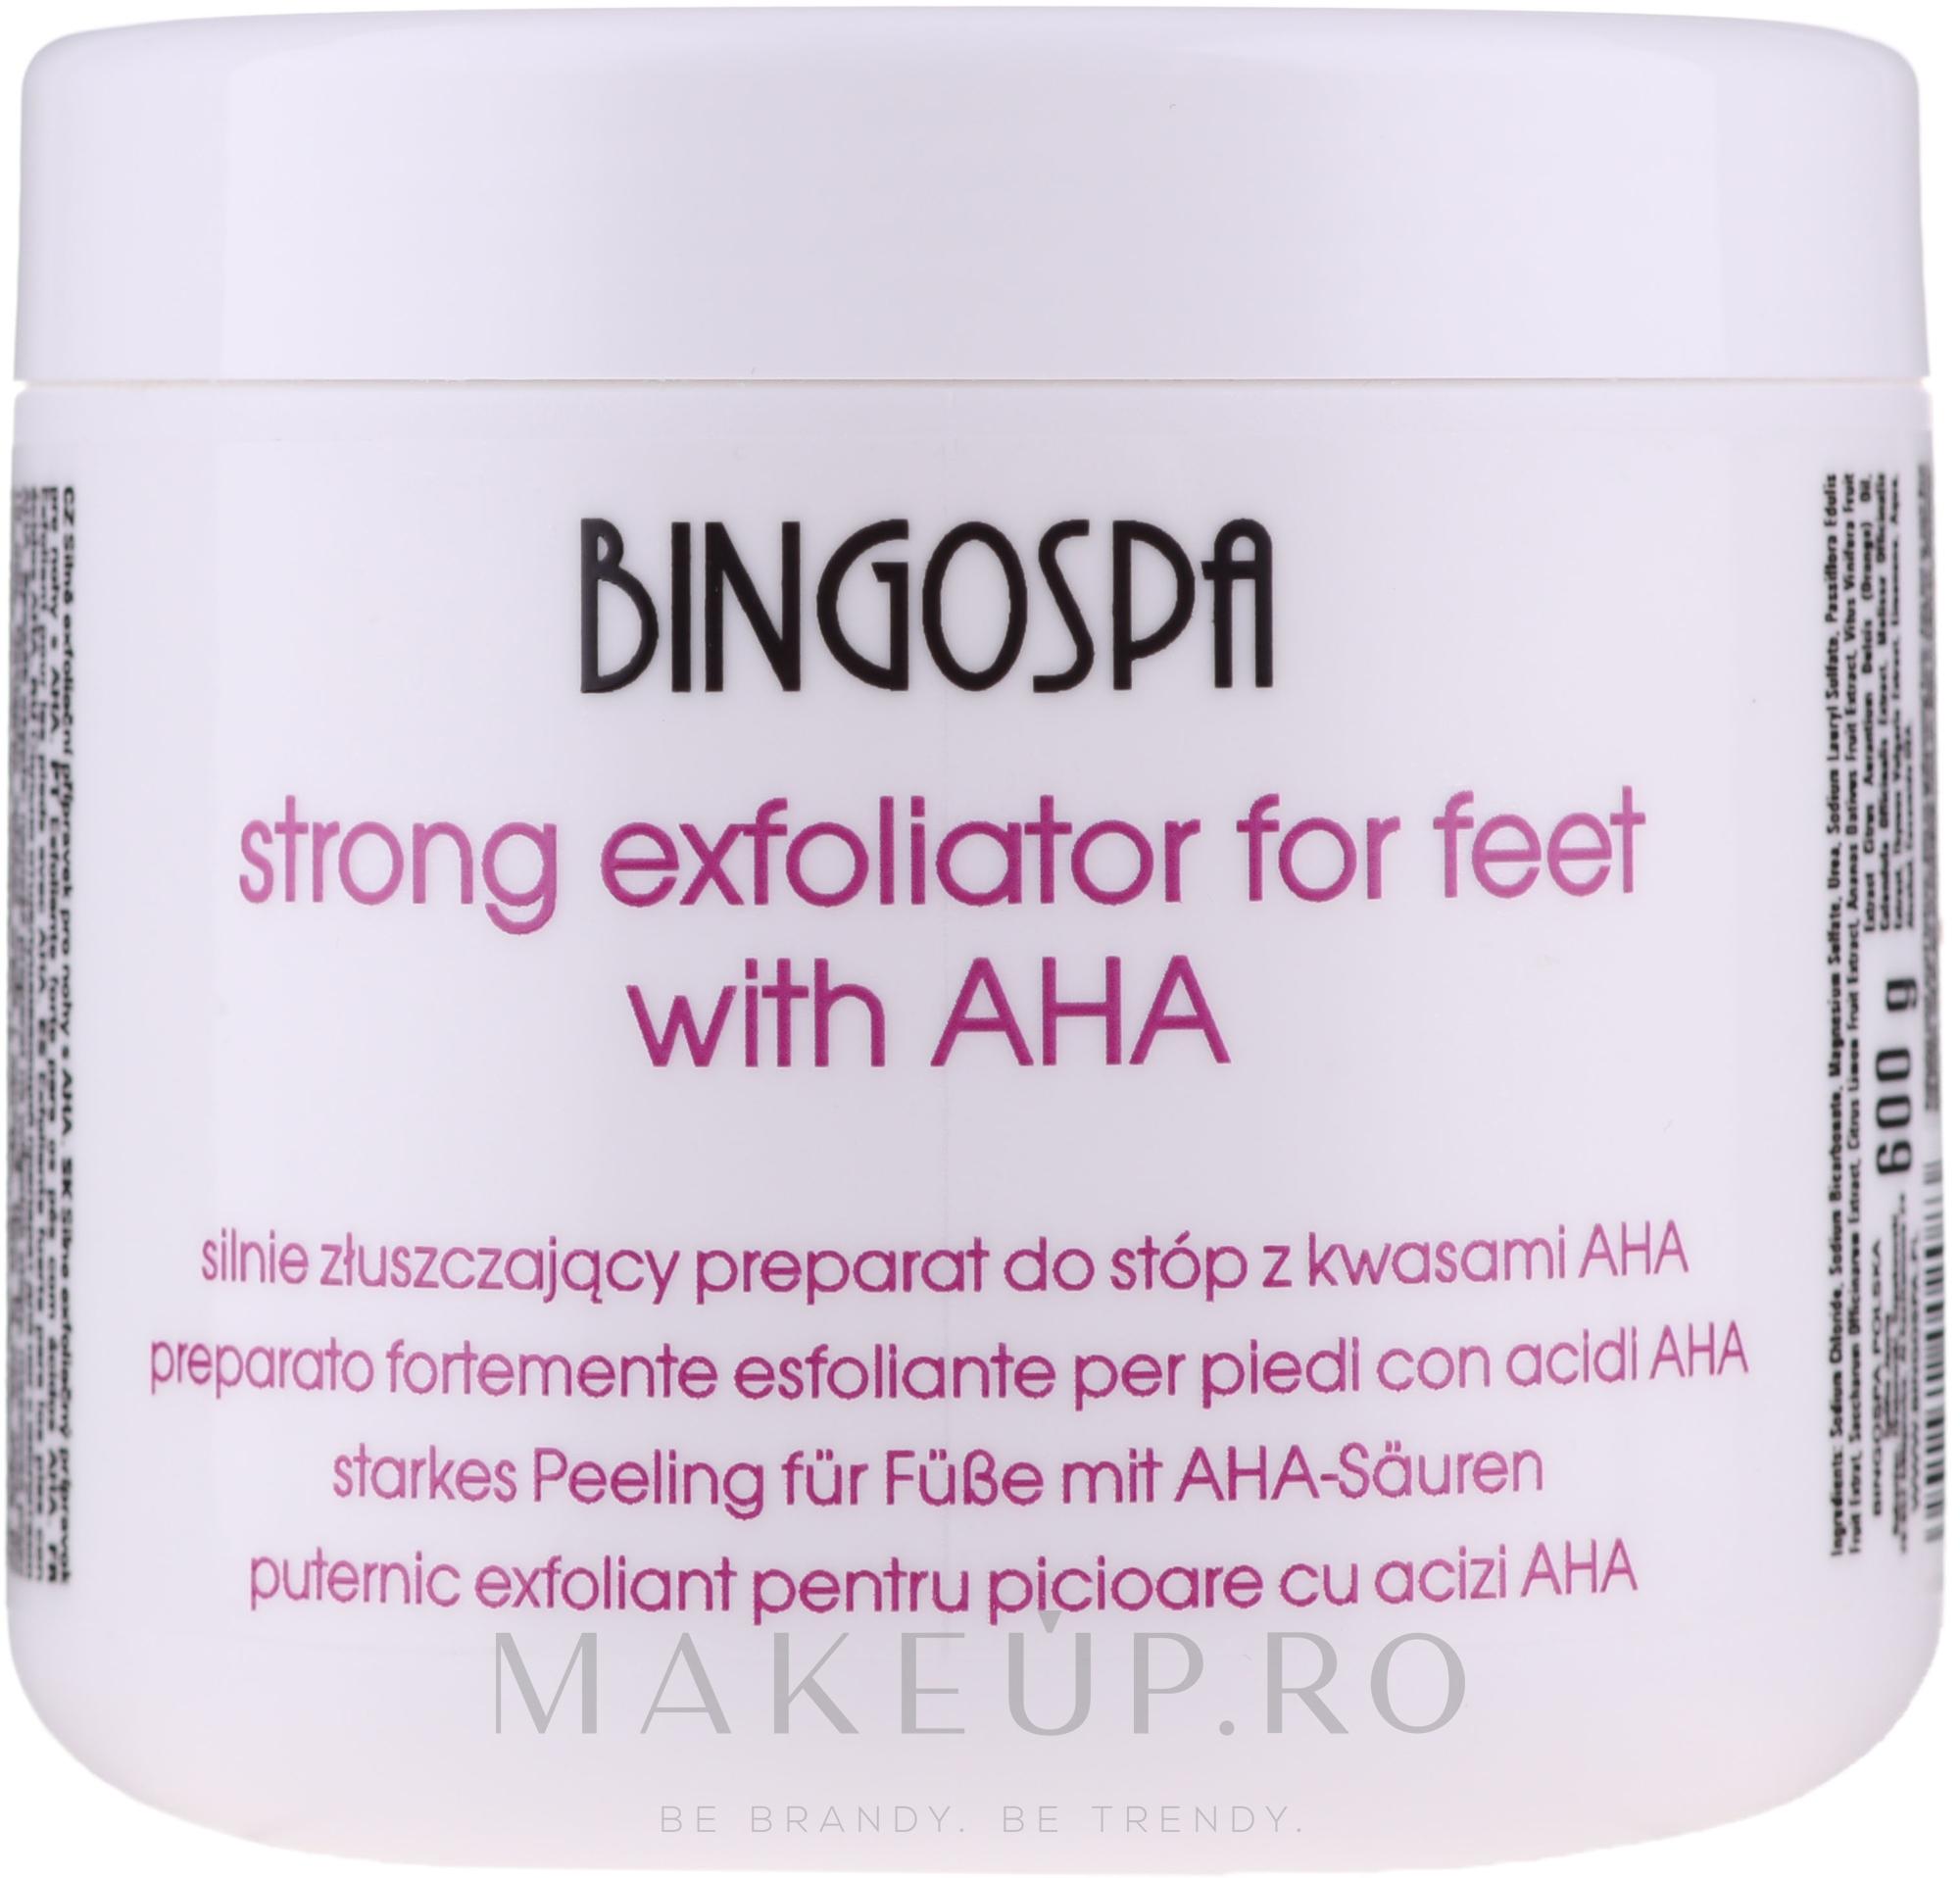 Exfoliant pentru picioare - BingoSpa Strong Exfoliant for Feet with AHA — Imagine 600 g